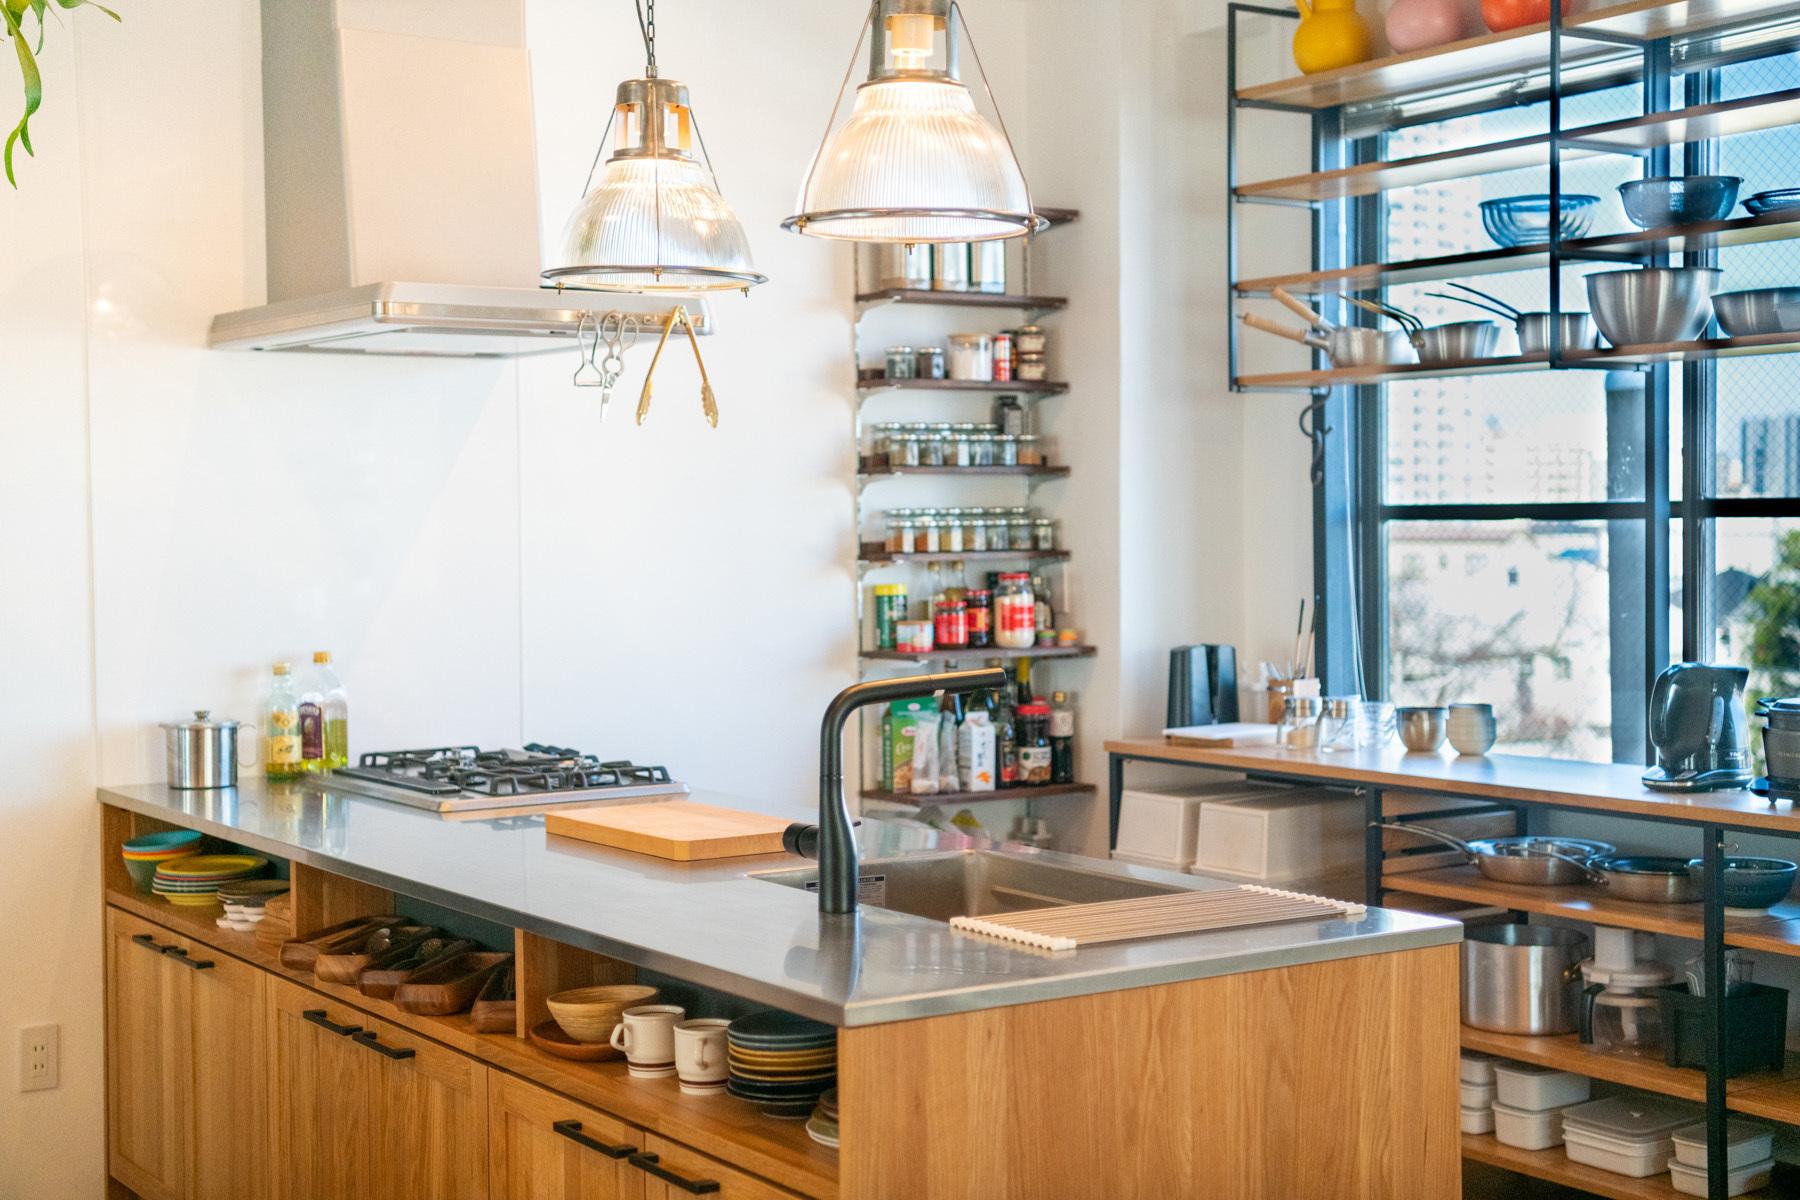 studio Licorne Nero 野沢 (スタジオリコルネネロ野沢)5F